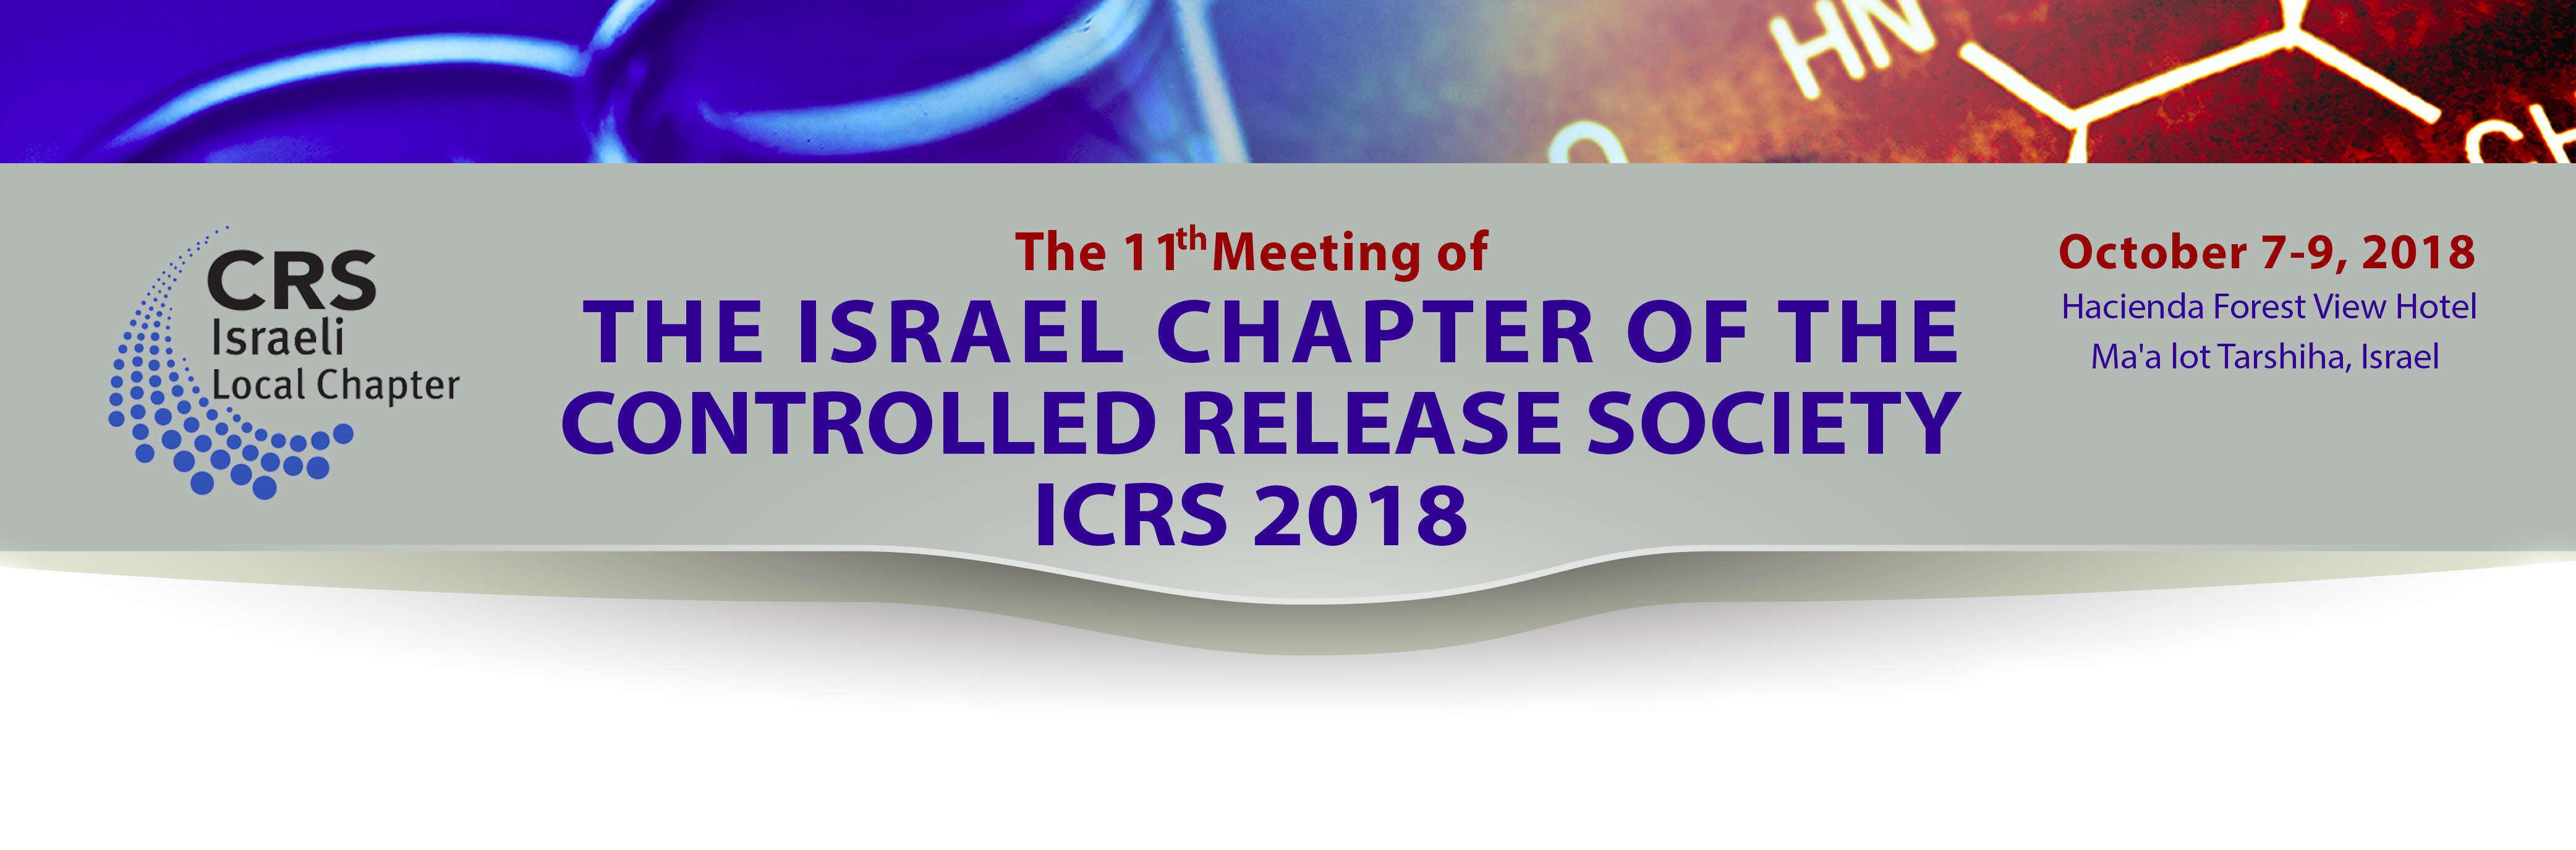 ICRS 2018